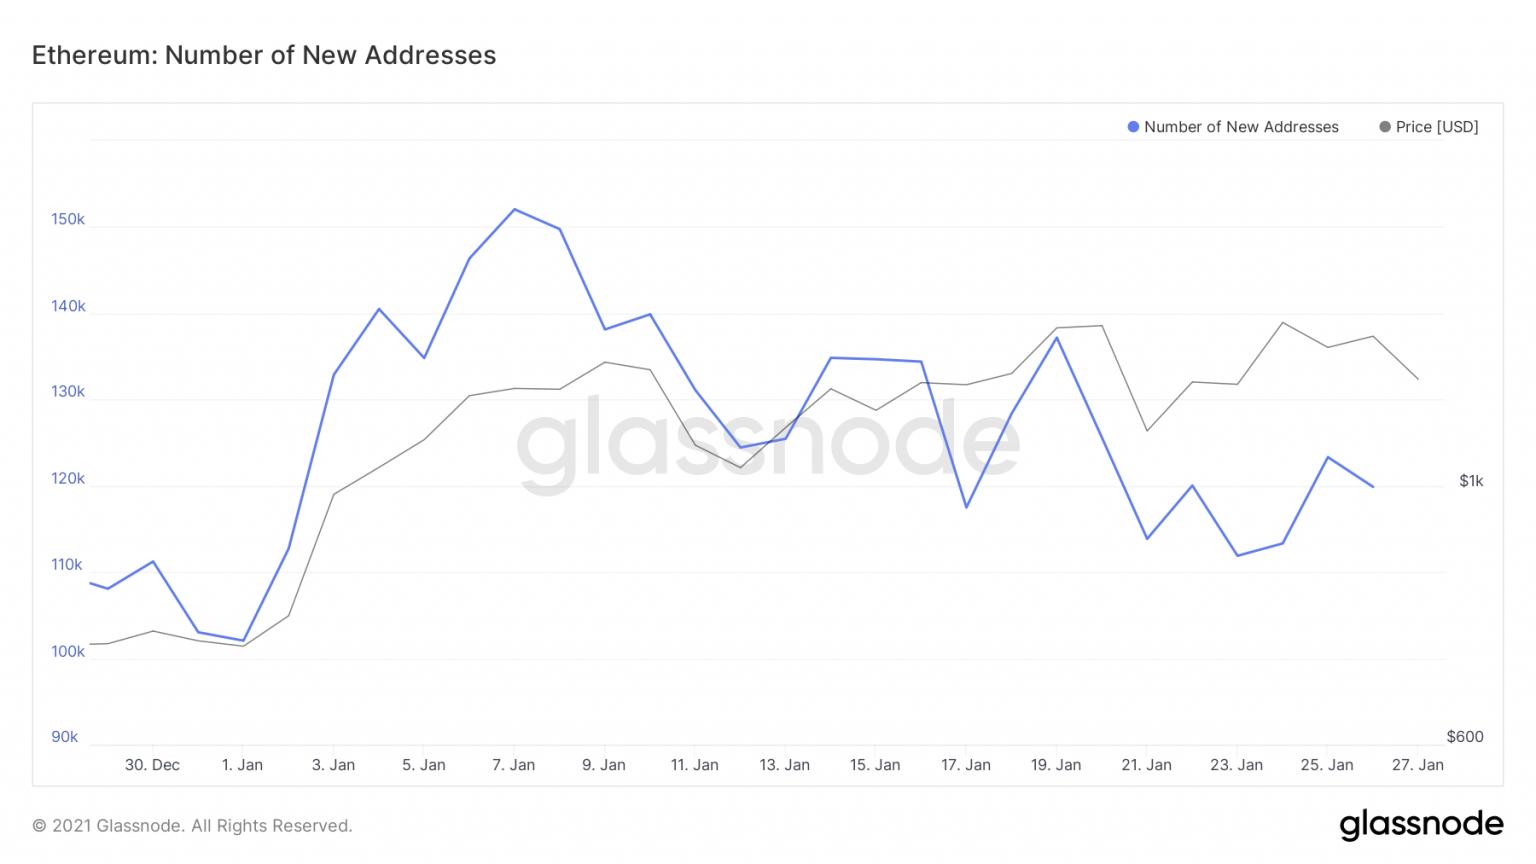 Number of New Ethereum Addresses